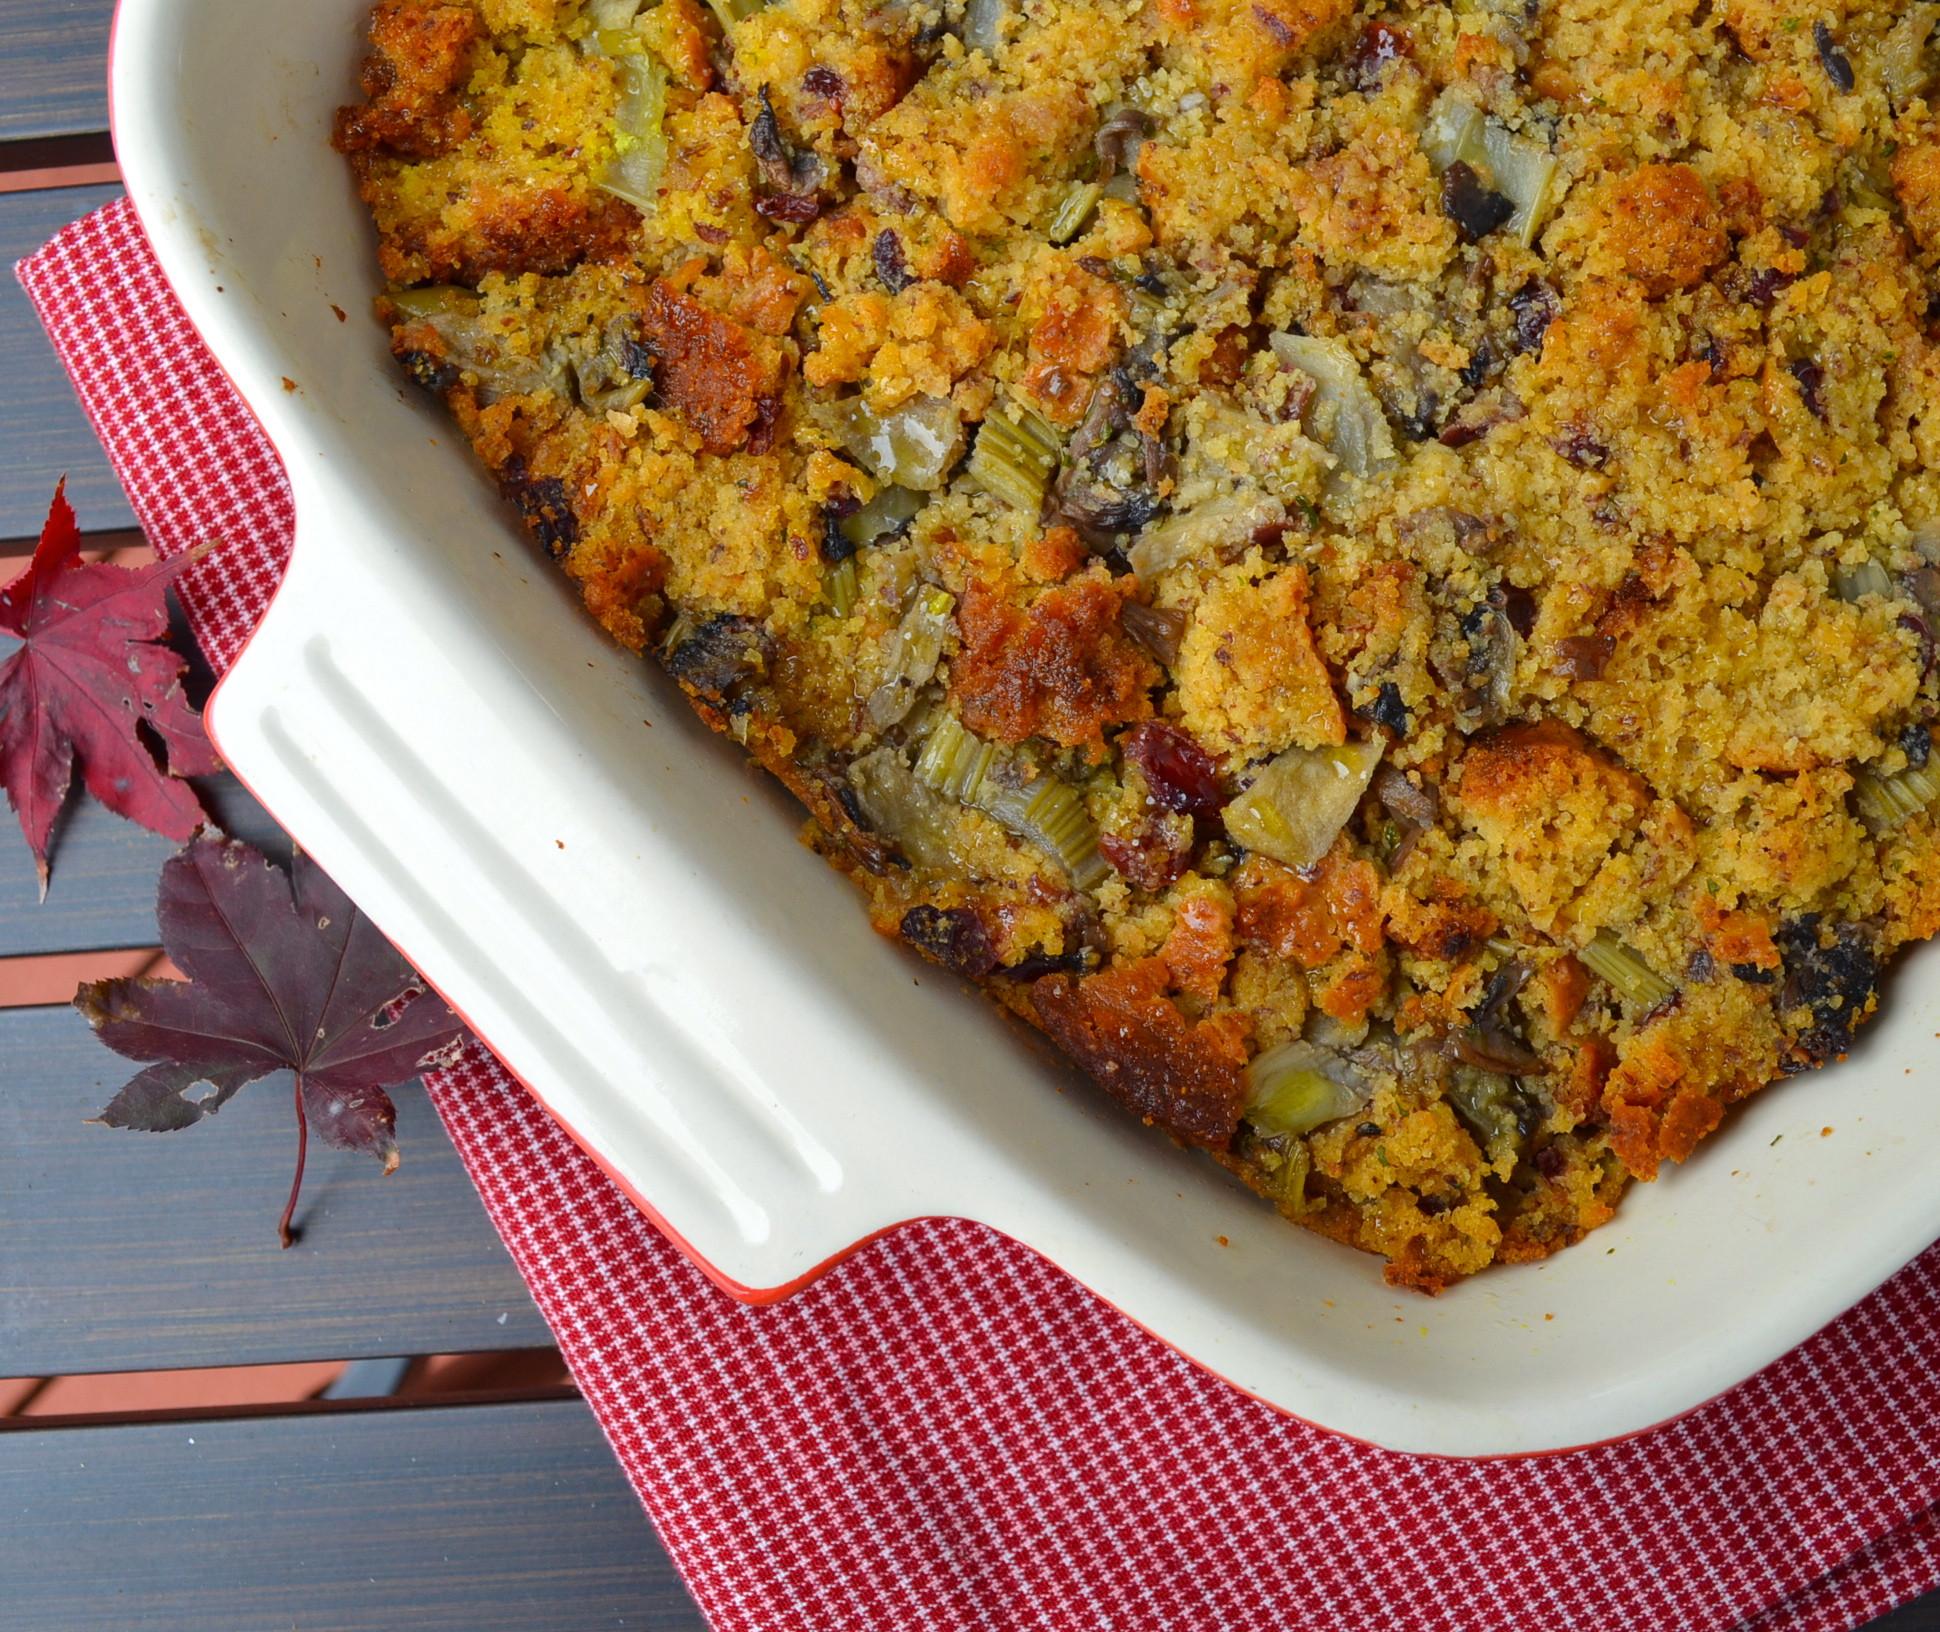 Vegan Stuffing Recipes For Thanksgiving  Ideas For A Vegan Thanksgiving Part 4 Apple Chestnut